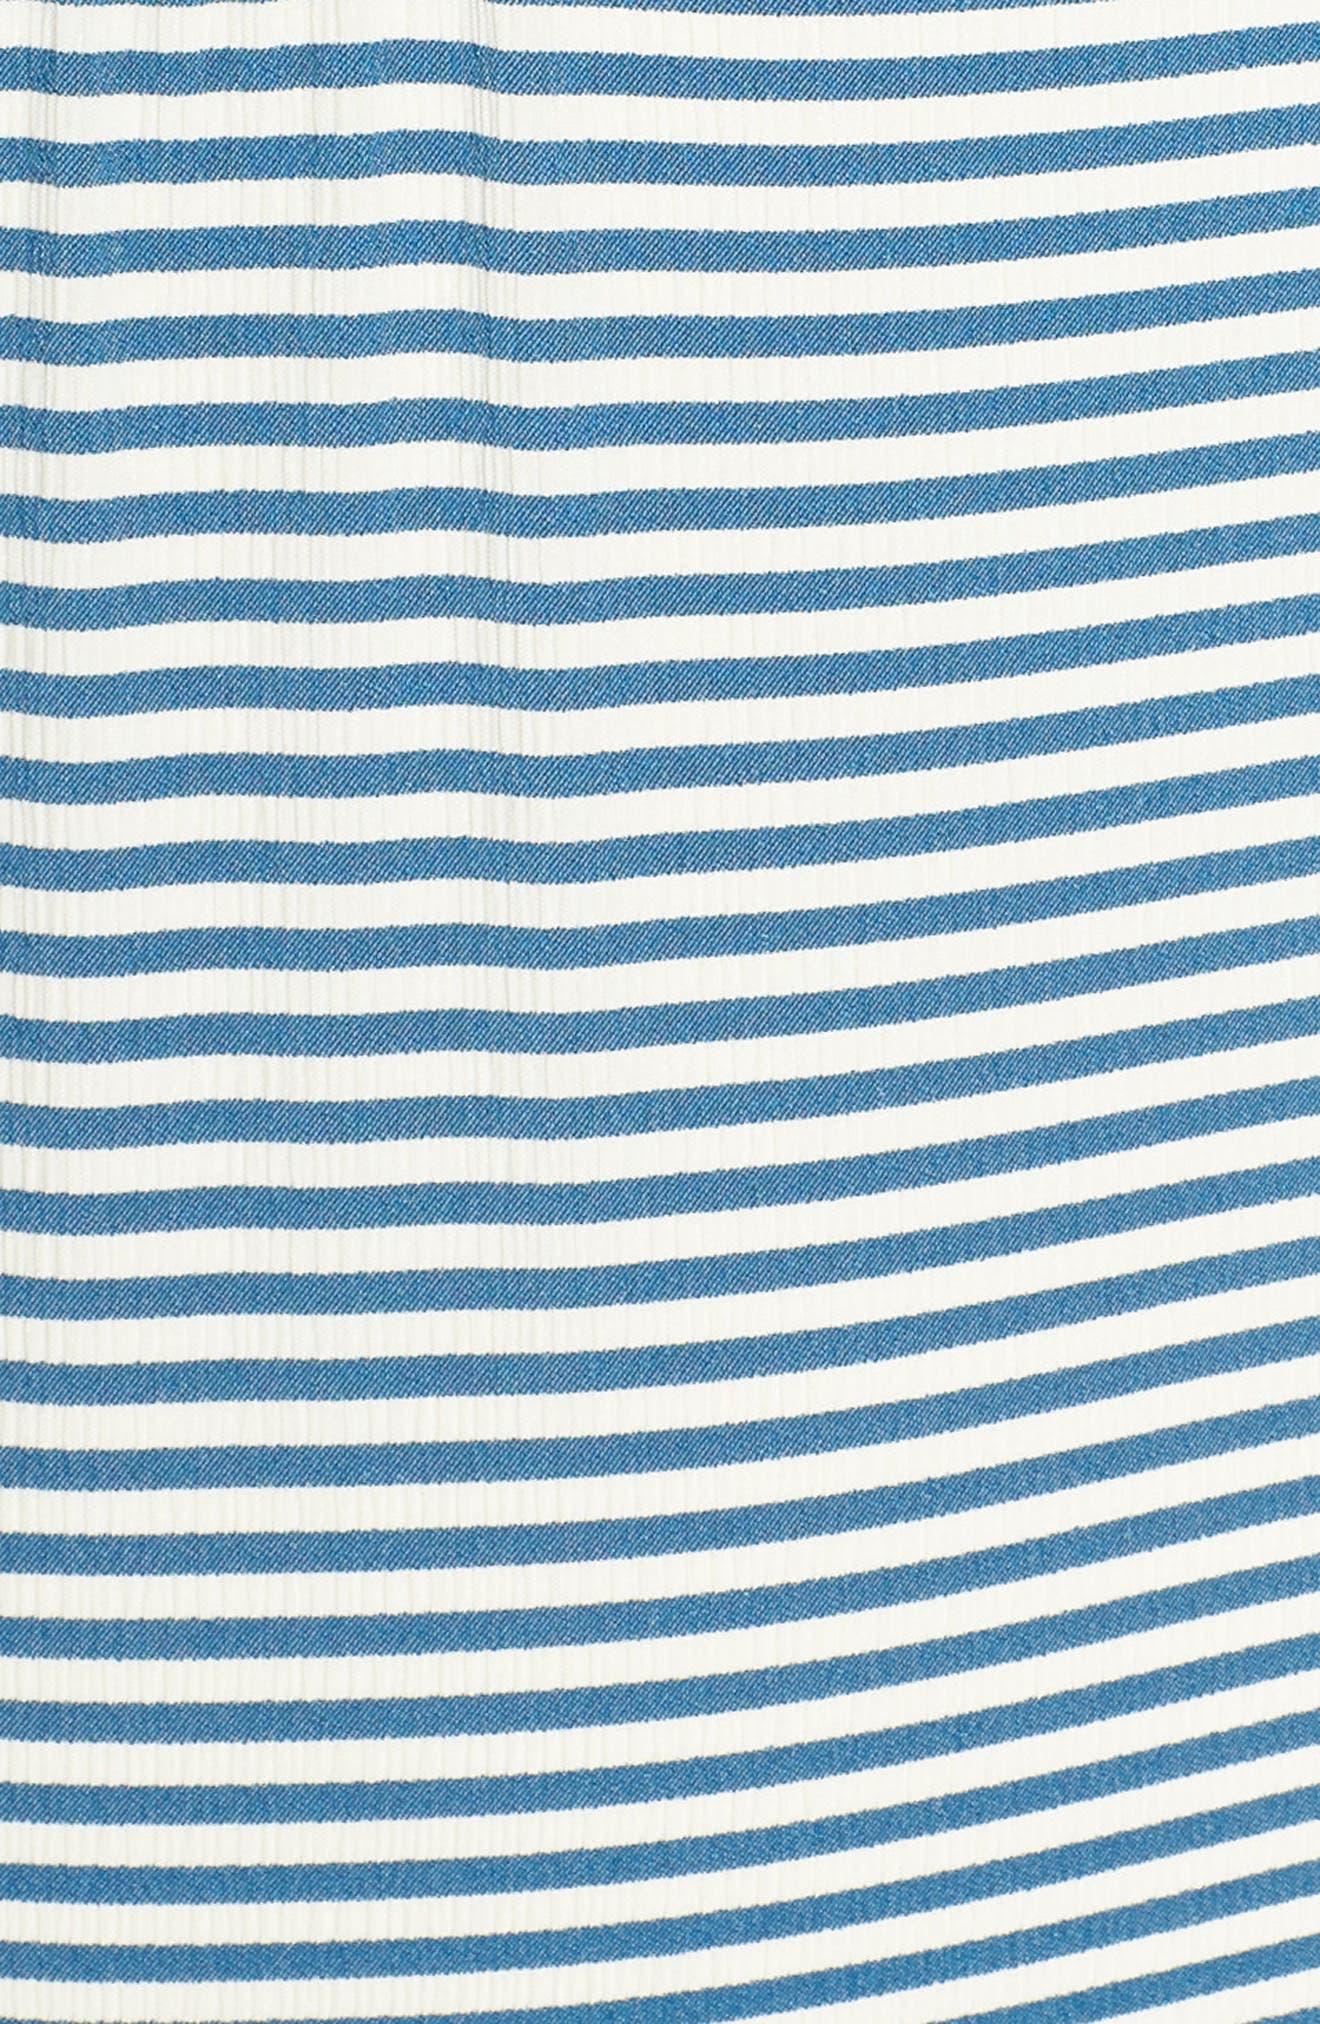 Sea Rinse One-Piece Swimsuit,                             Alternate thumbnail 5, color,                             Bright Indigo